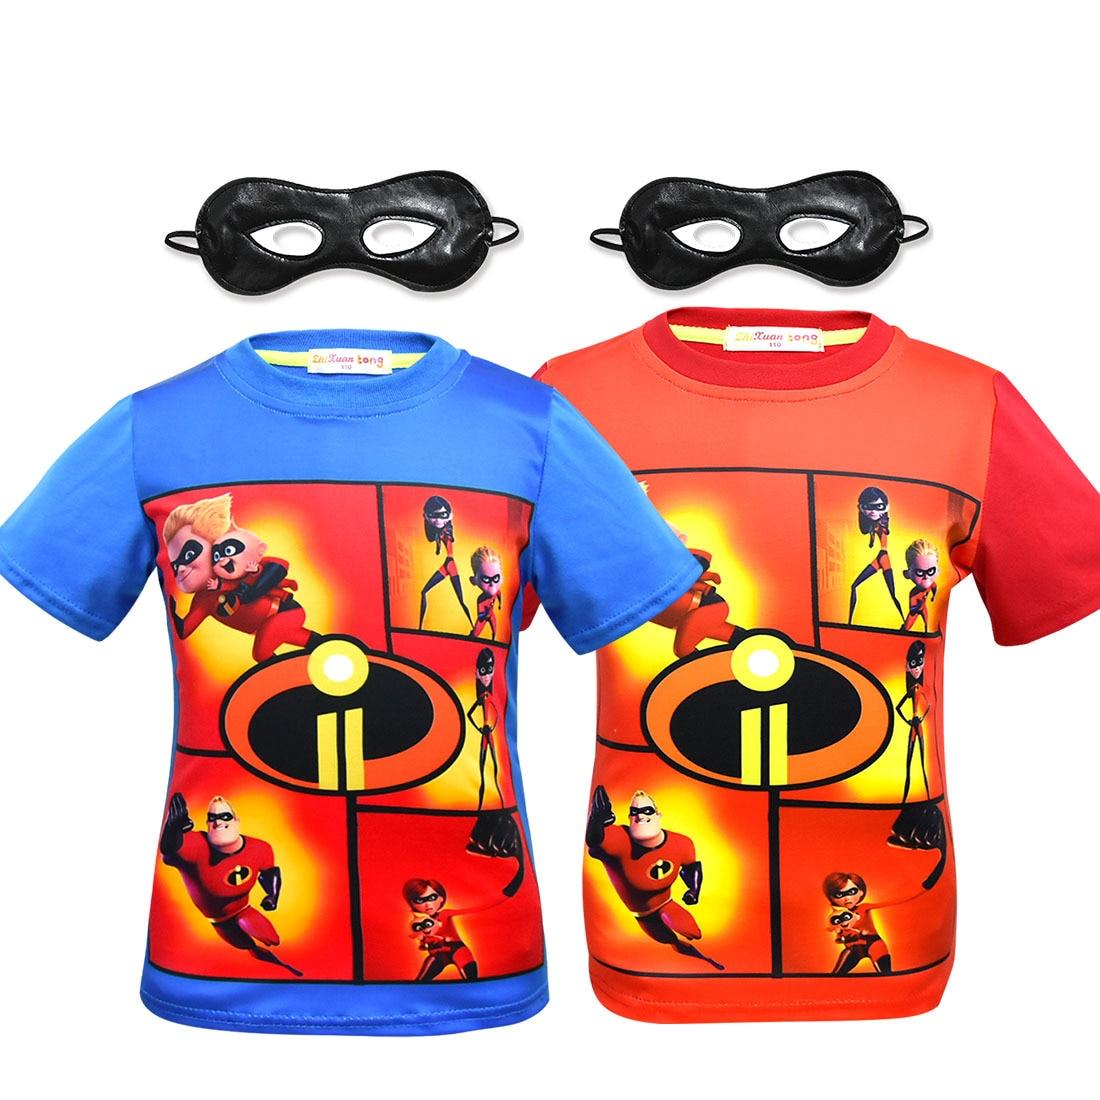 Hot Summer The Incredibles 2 T-shirt Kids Cartoon T shirt Boy's Girl's 3D Print Children's Clothing Halloween Cosplay Costume